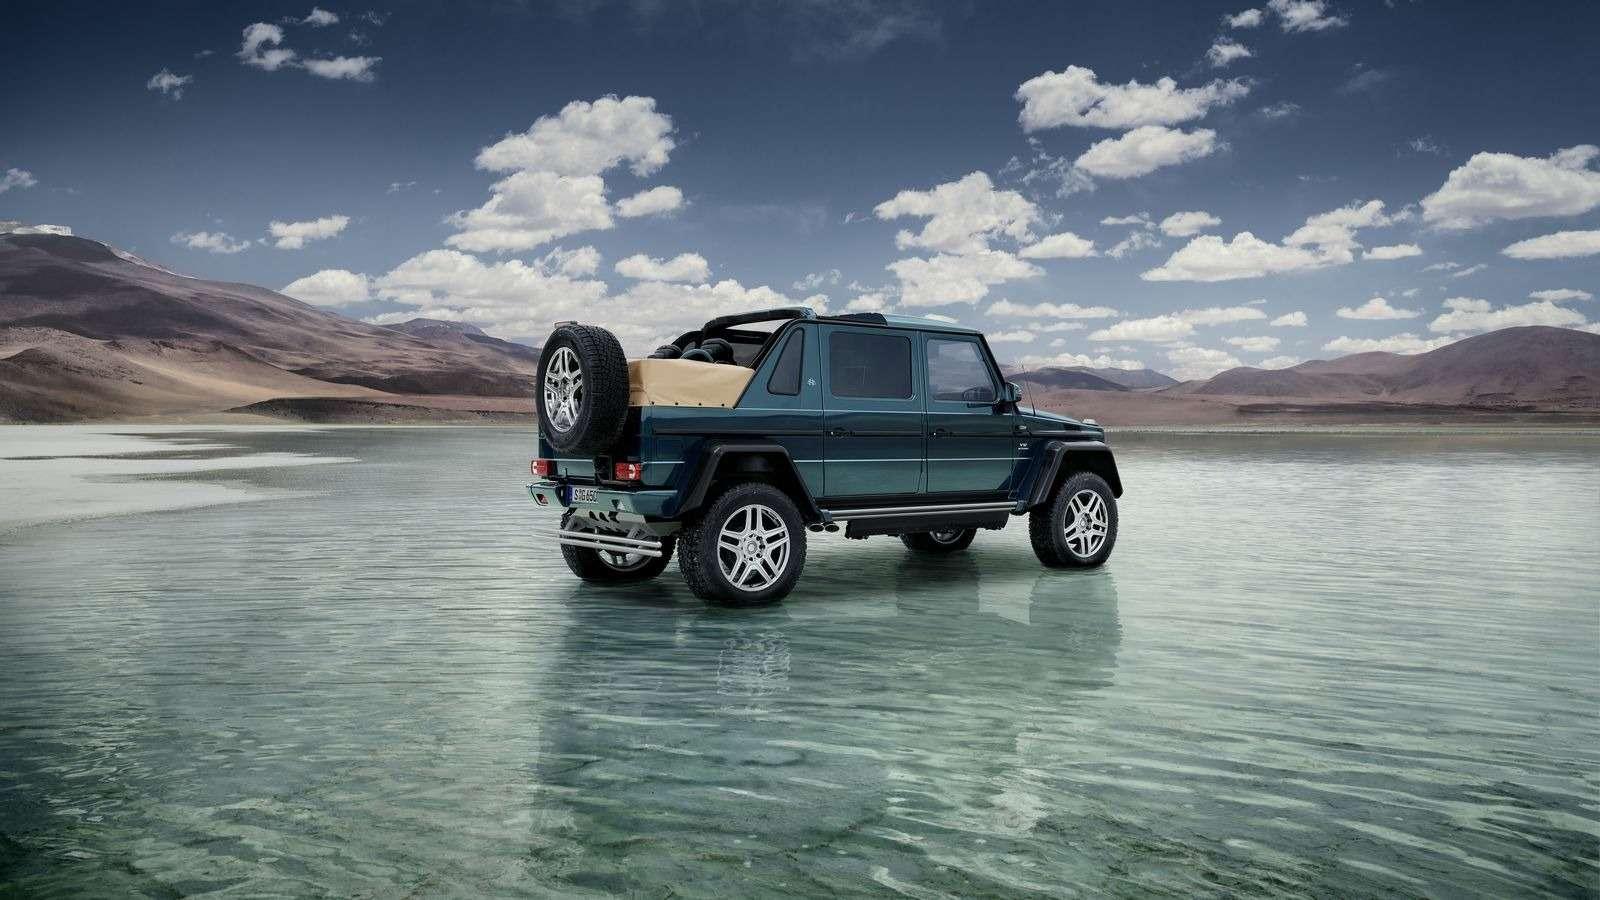 Mercedes-Maybach представил люксовый кабриолет G-класса— фото 706750